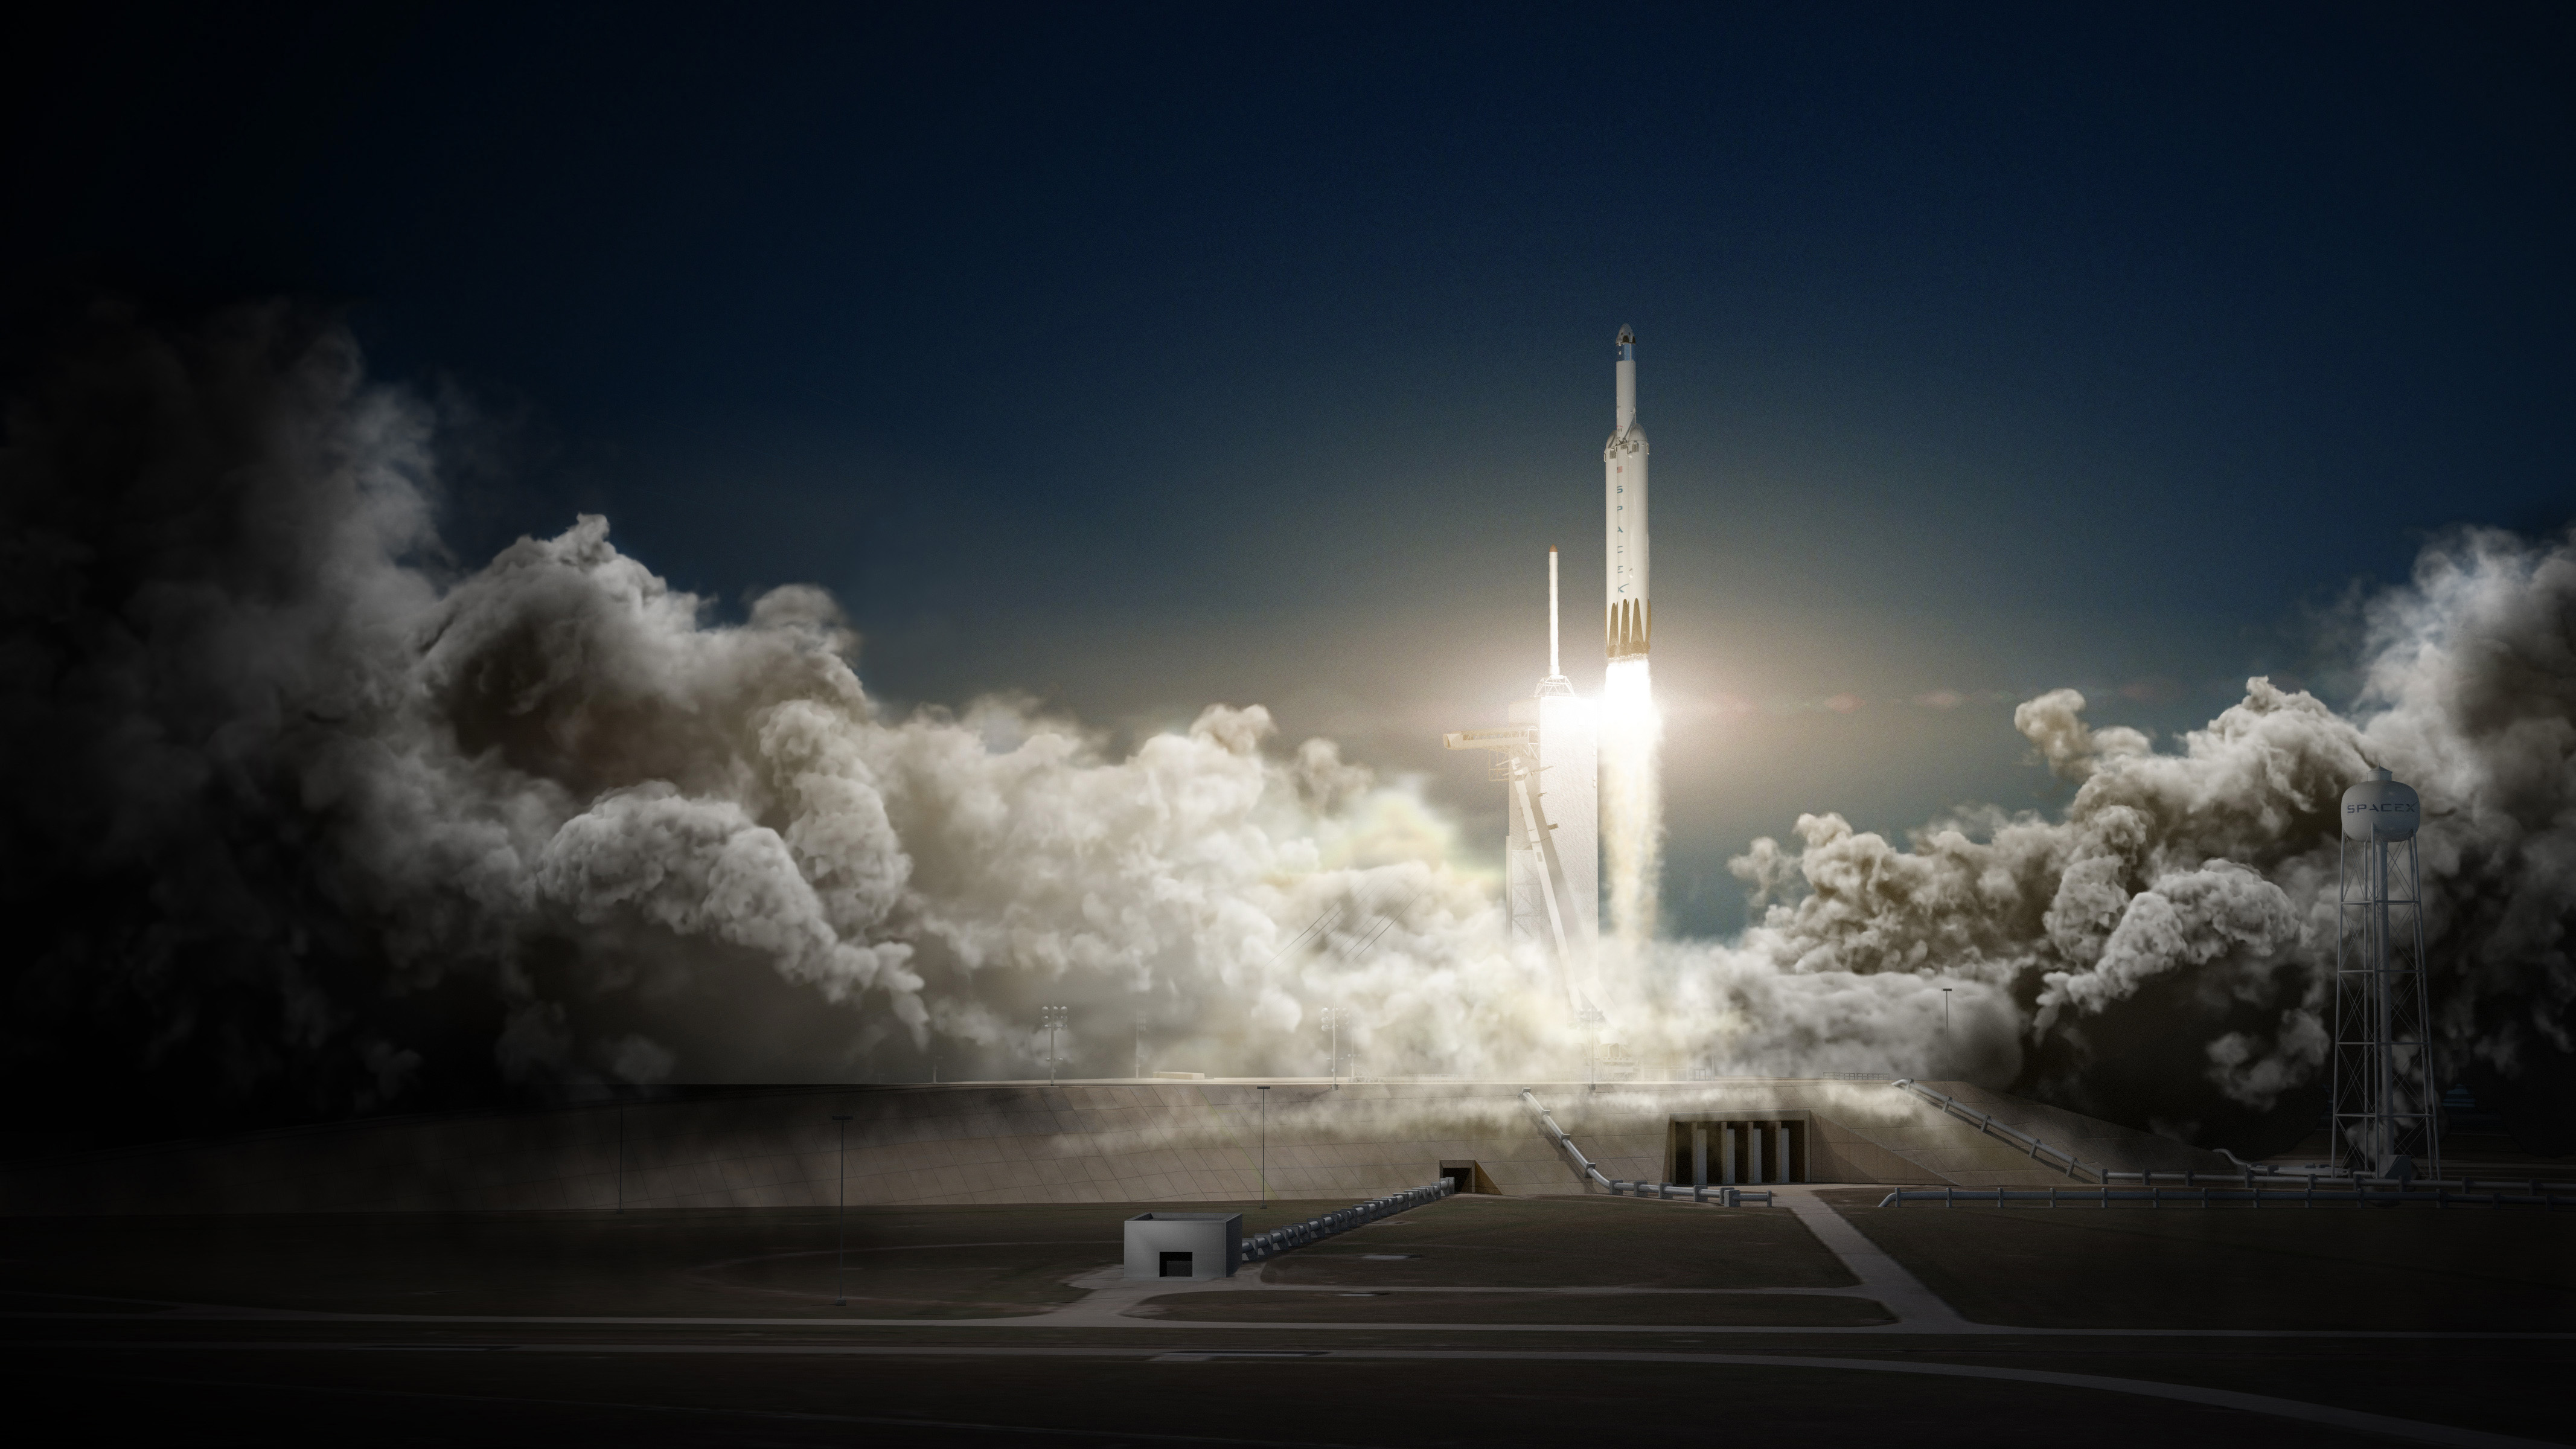 SpaceXRocketmissionimage